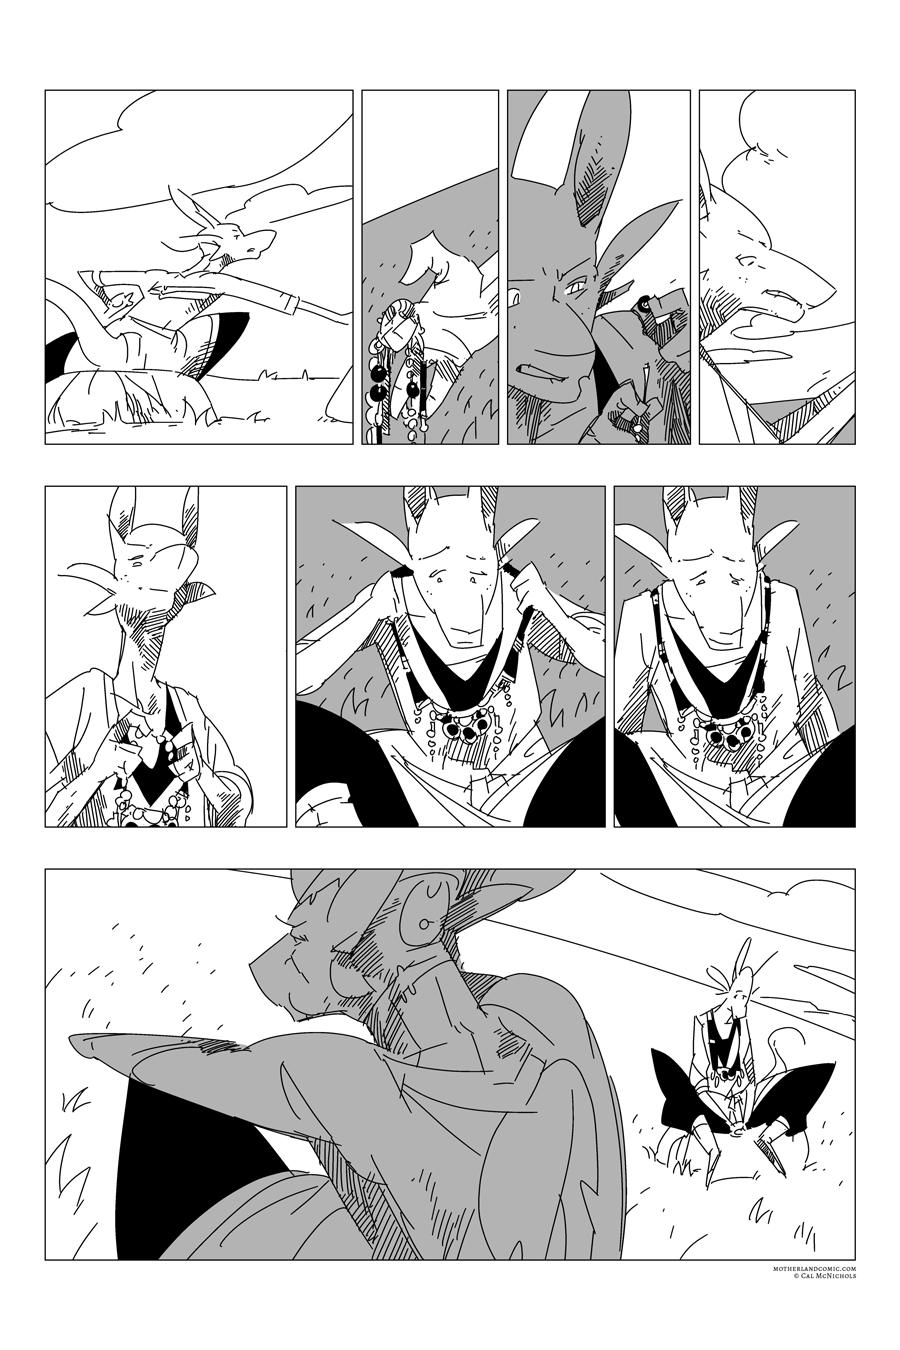 pg 89